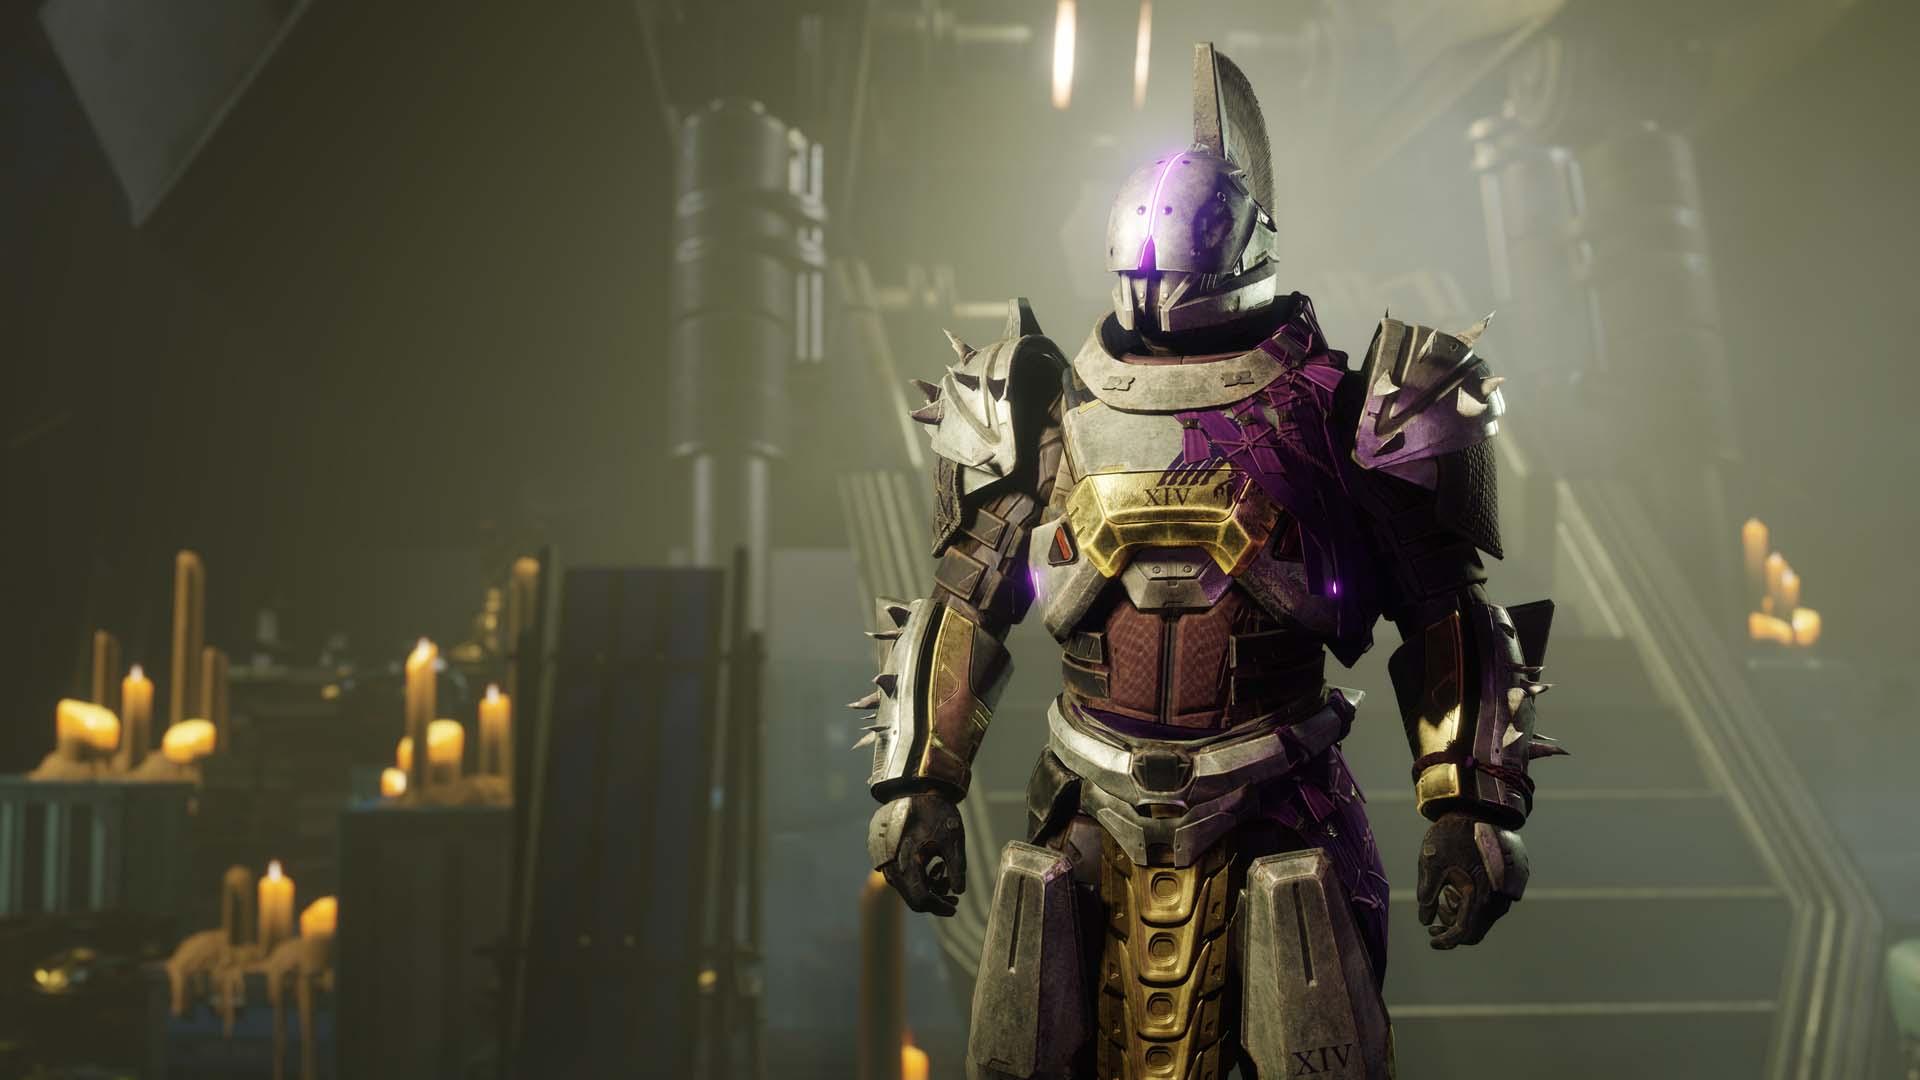 Saint-14 Destiny 2 Season of Dawn